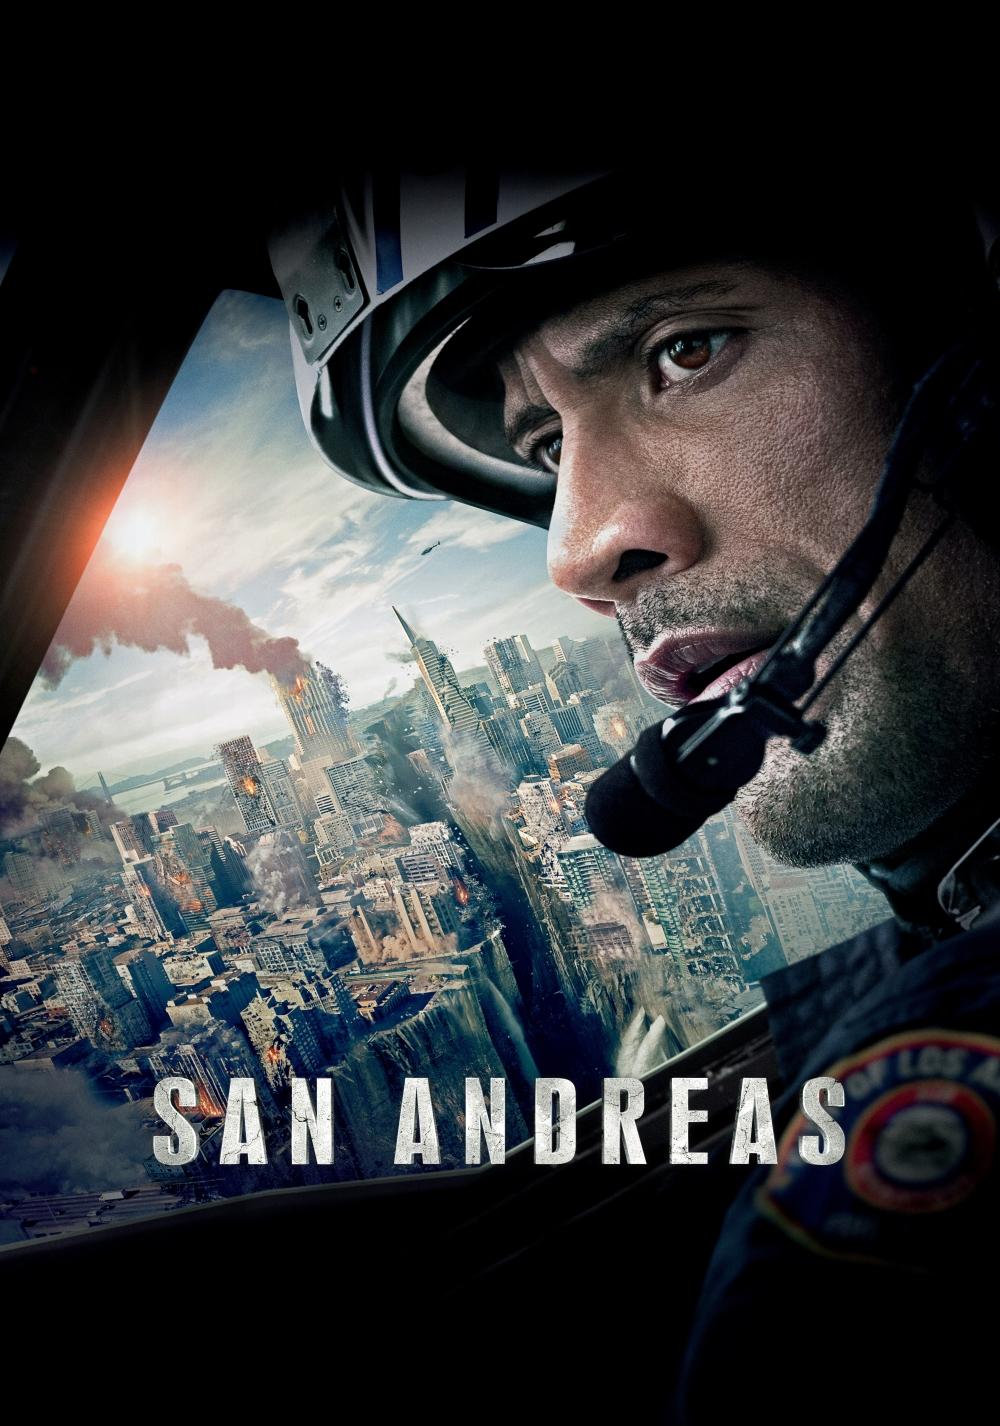 San Andreas | Movie fanart | fanart.tv